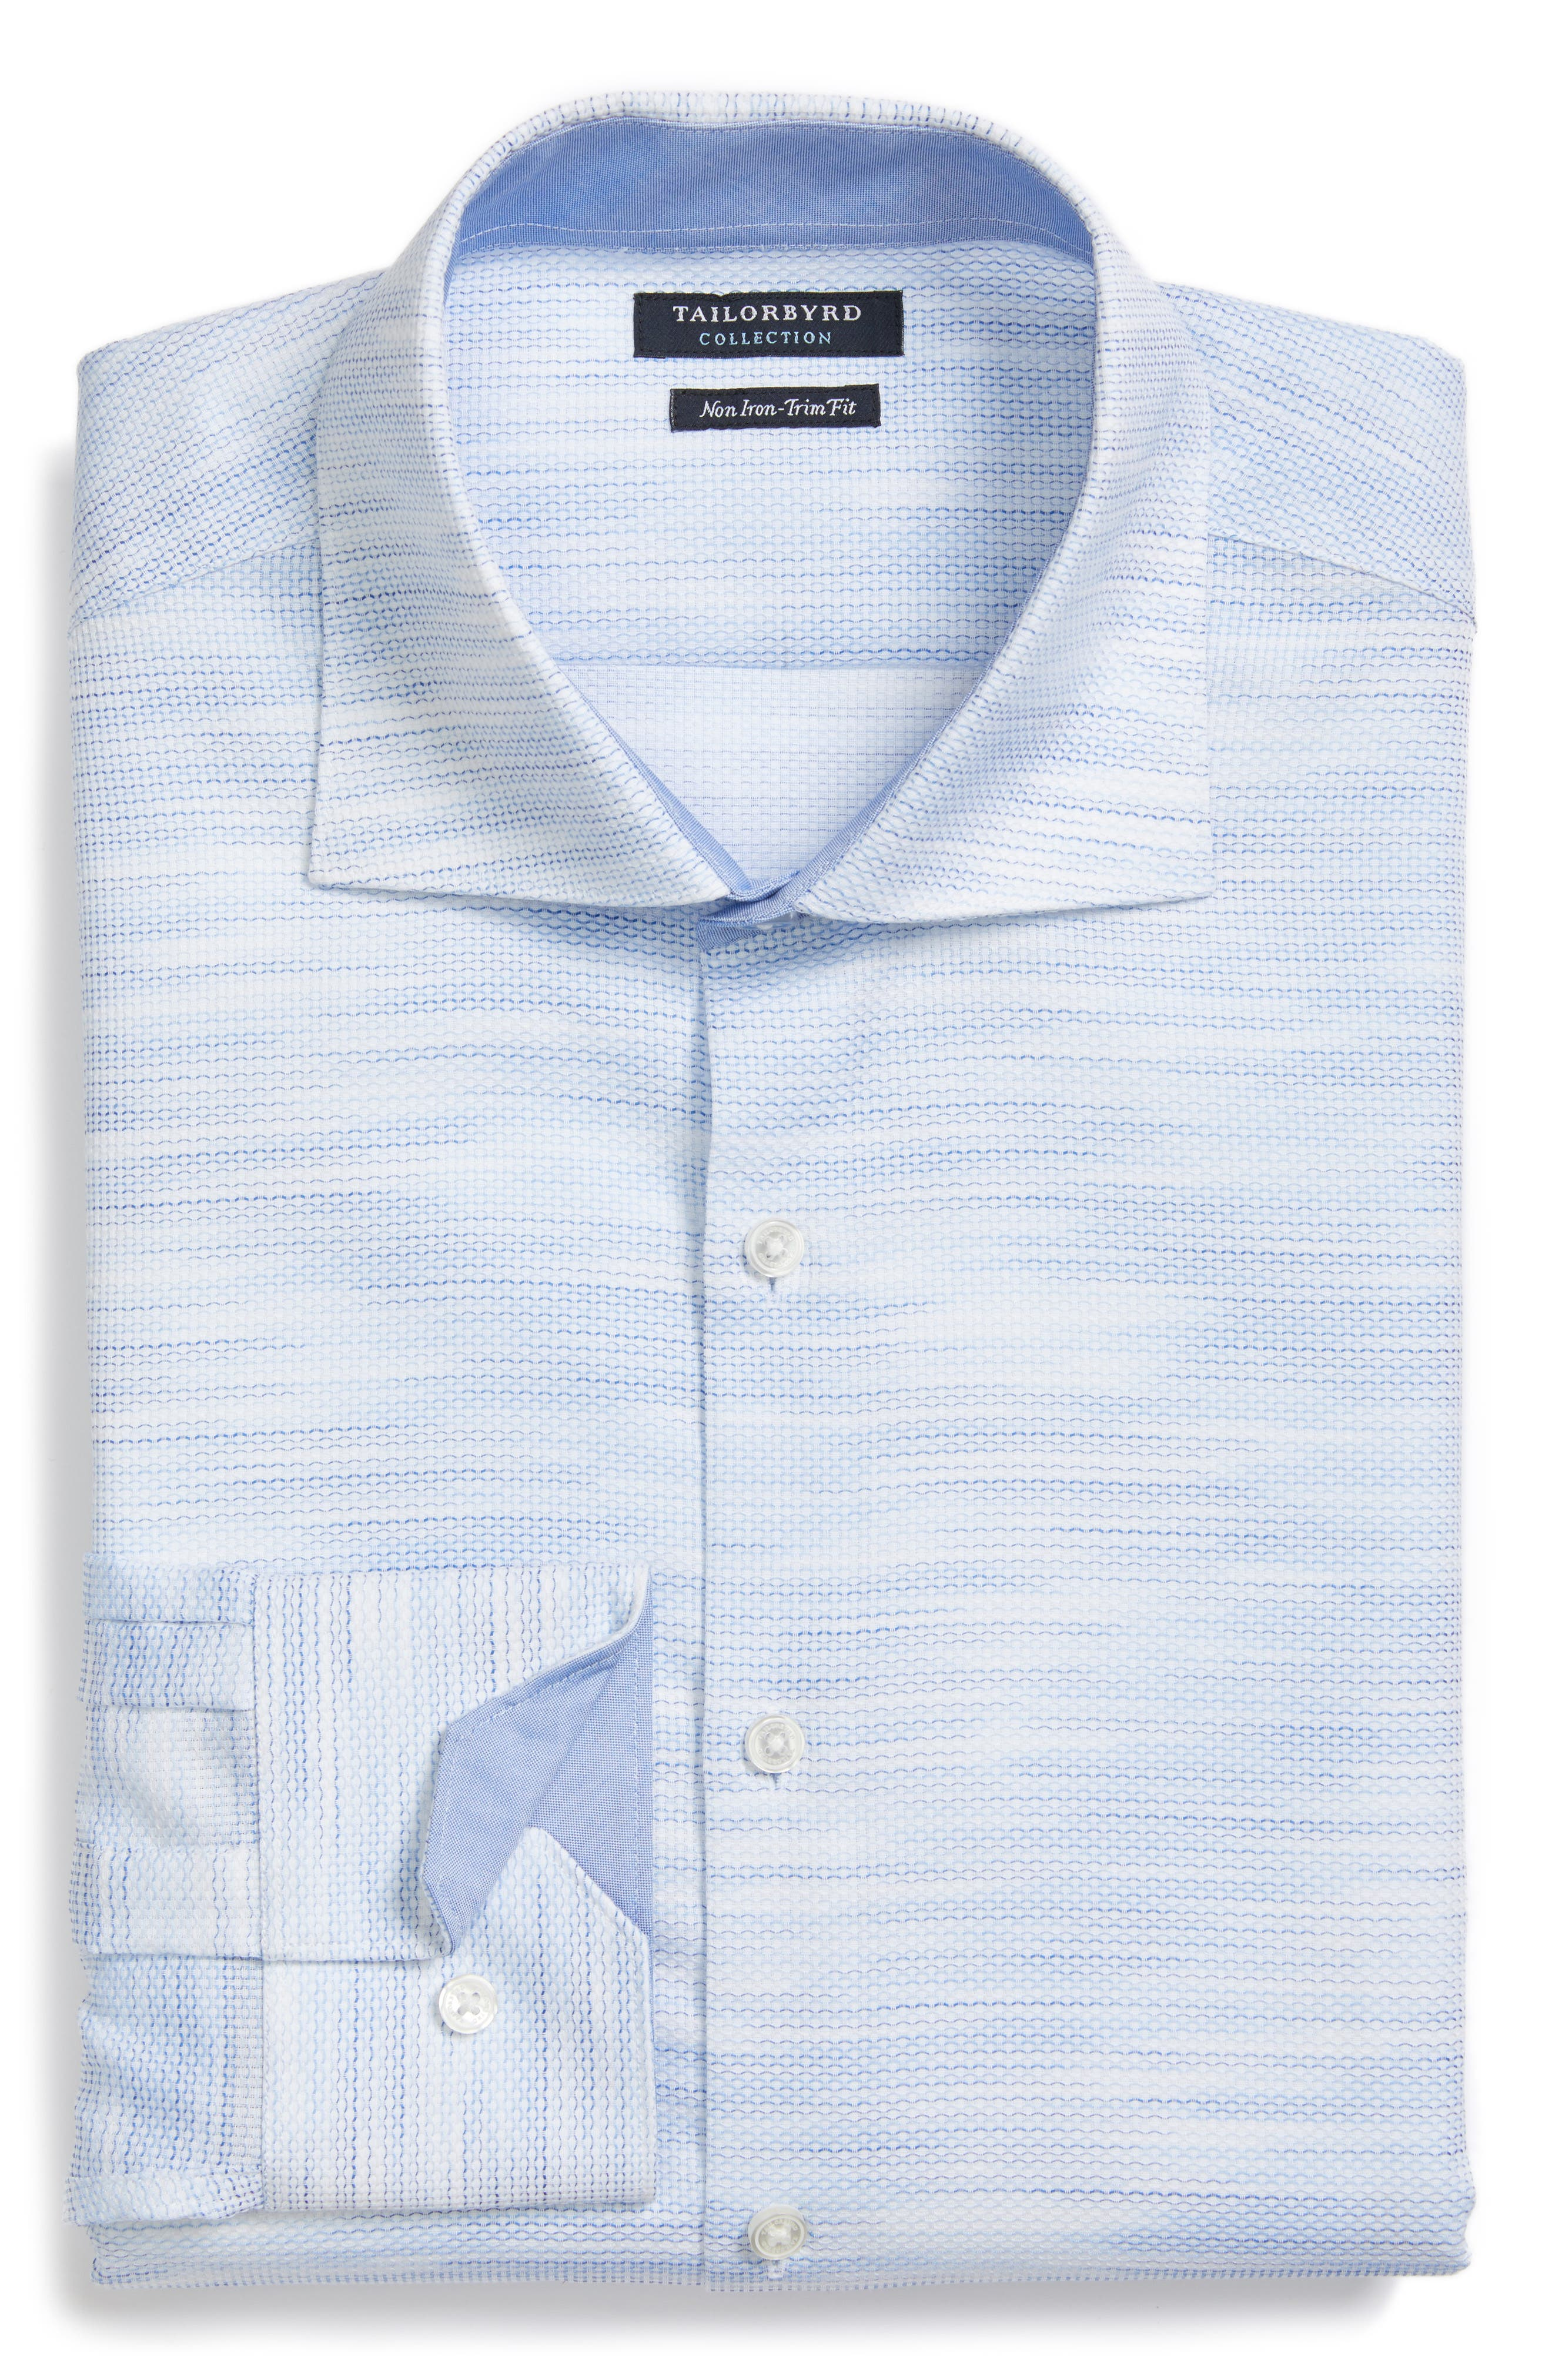 Alternate Image 4  - Tailorbyrd Trim Fit Solid Dress Shirt